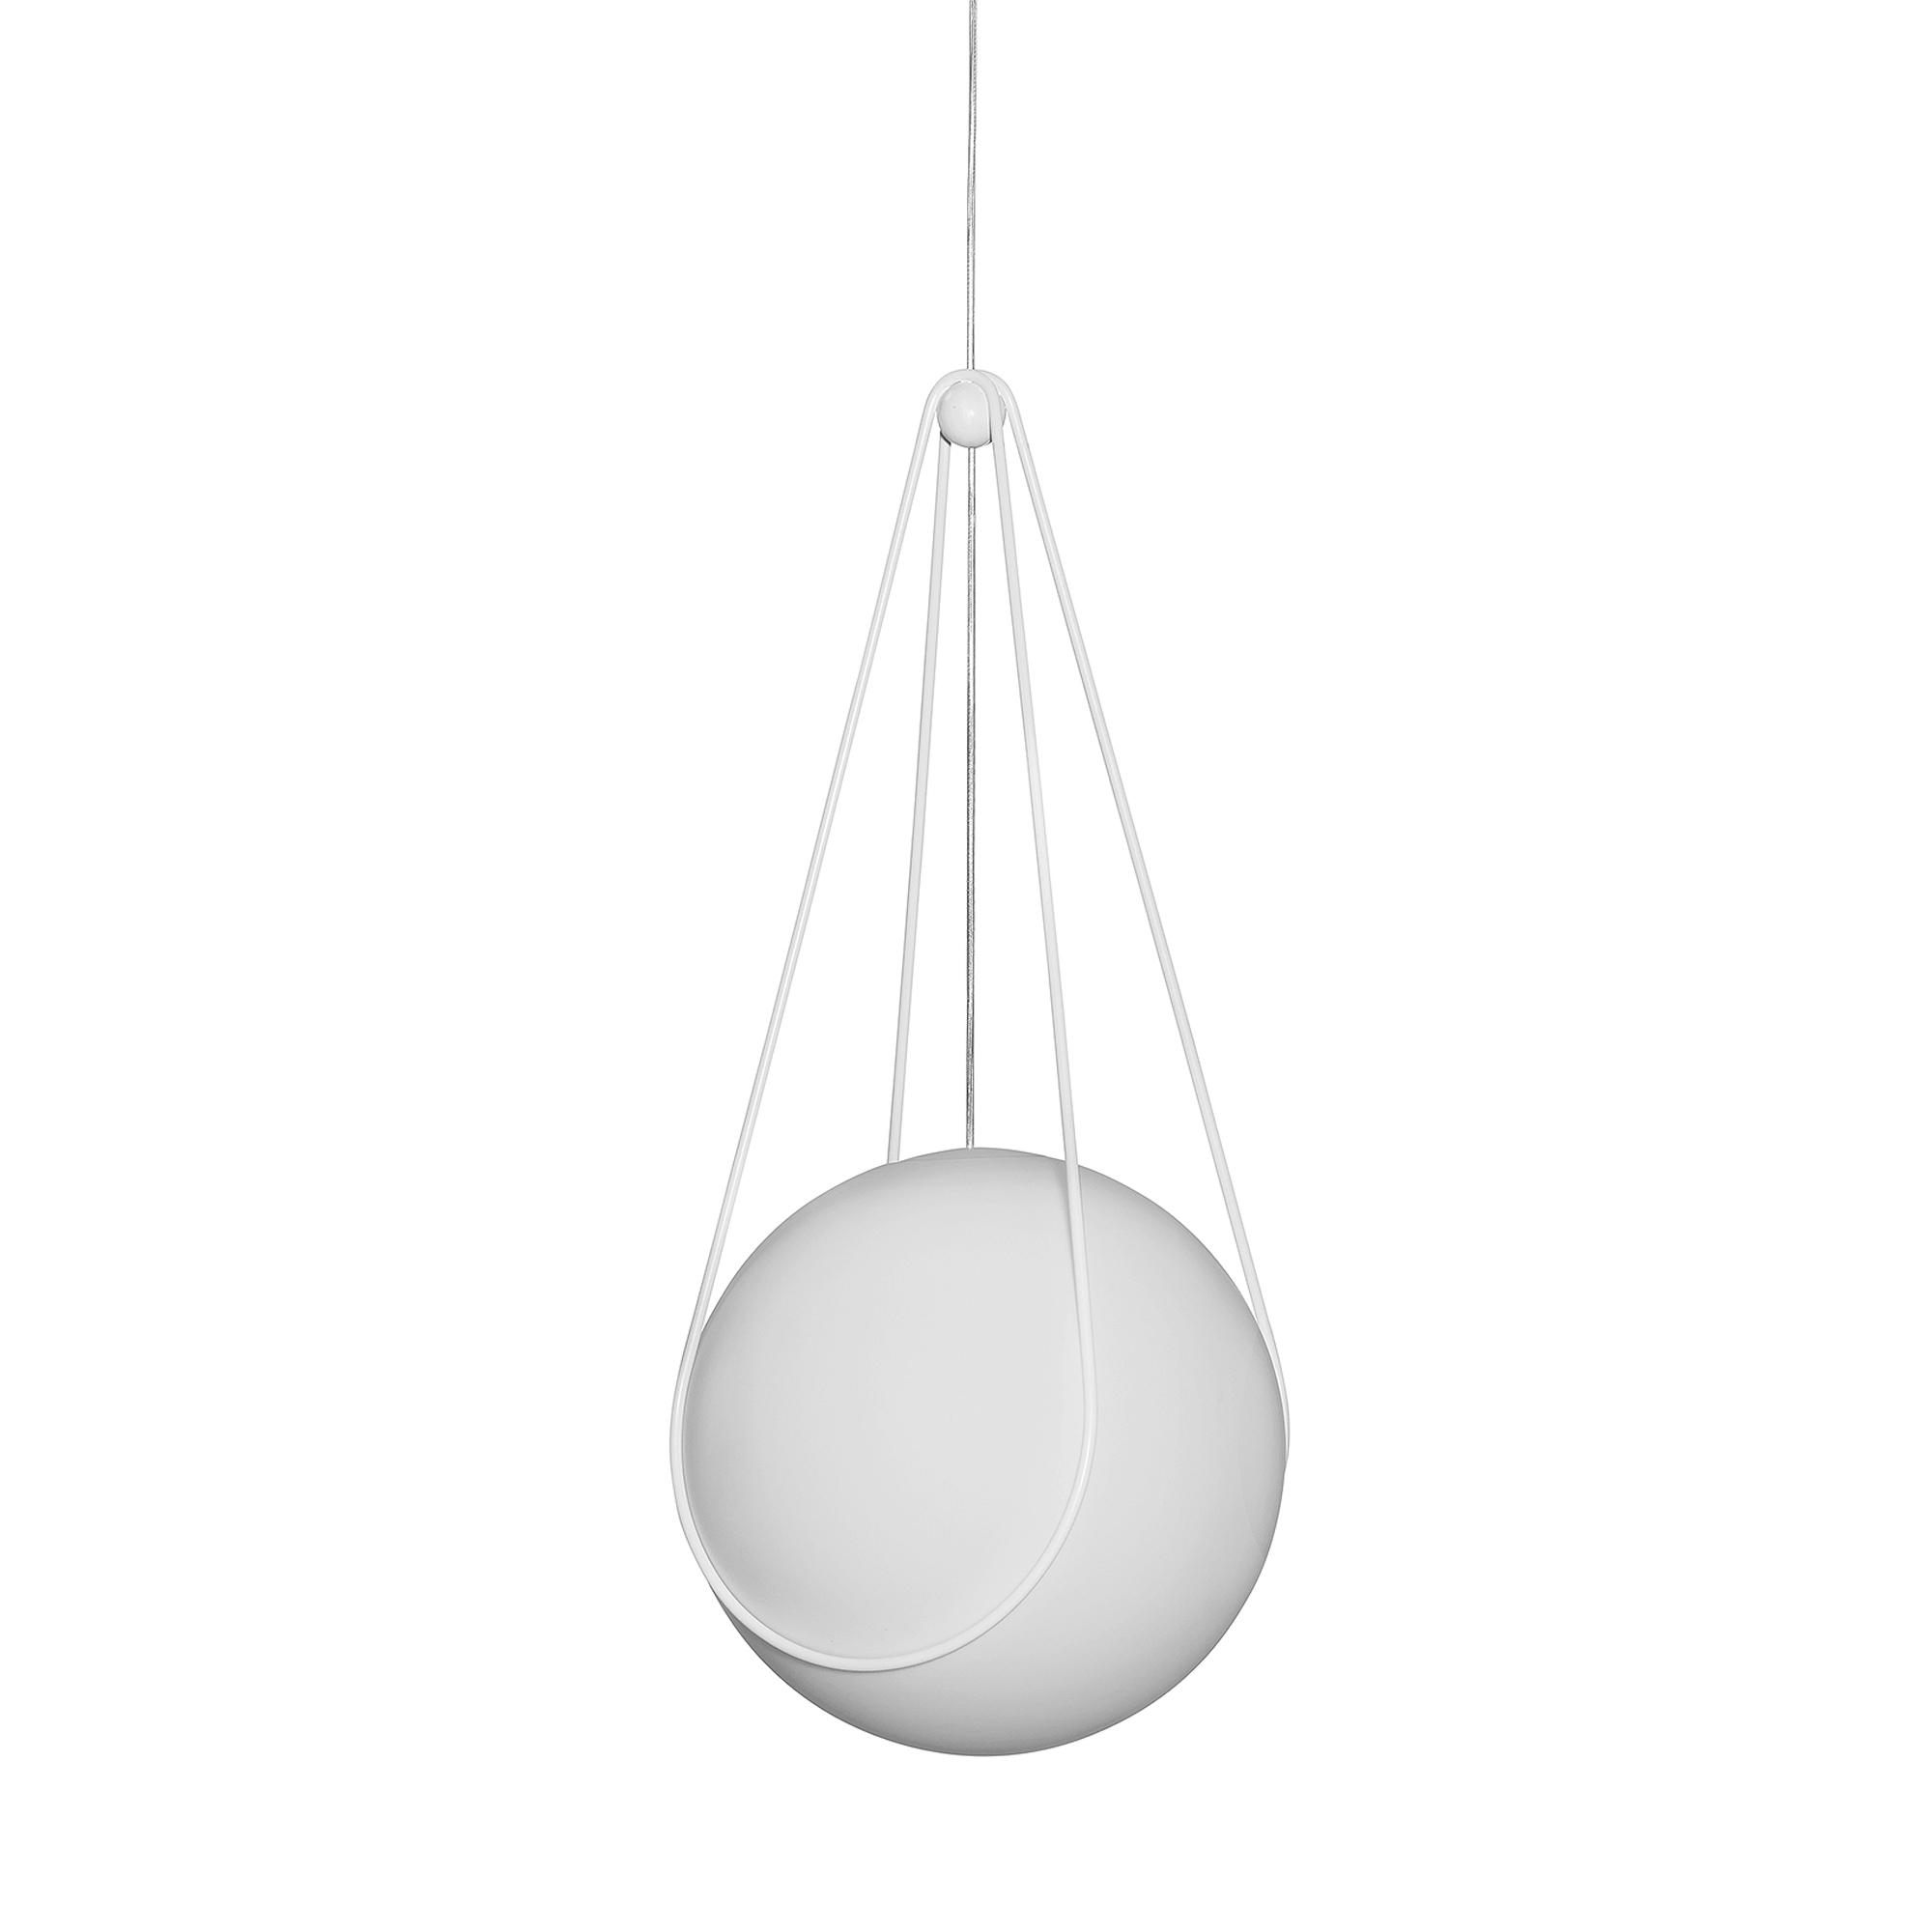 Design House Stockholm Lamphållare Kosmos 400mm vit